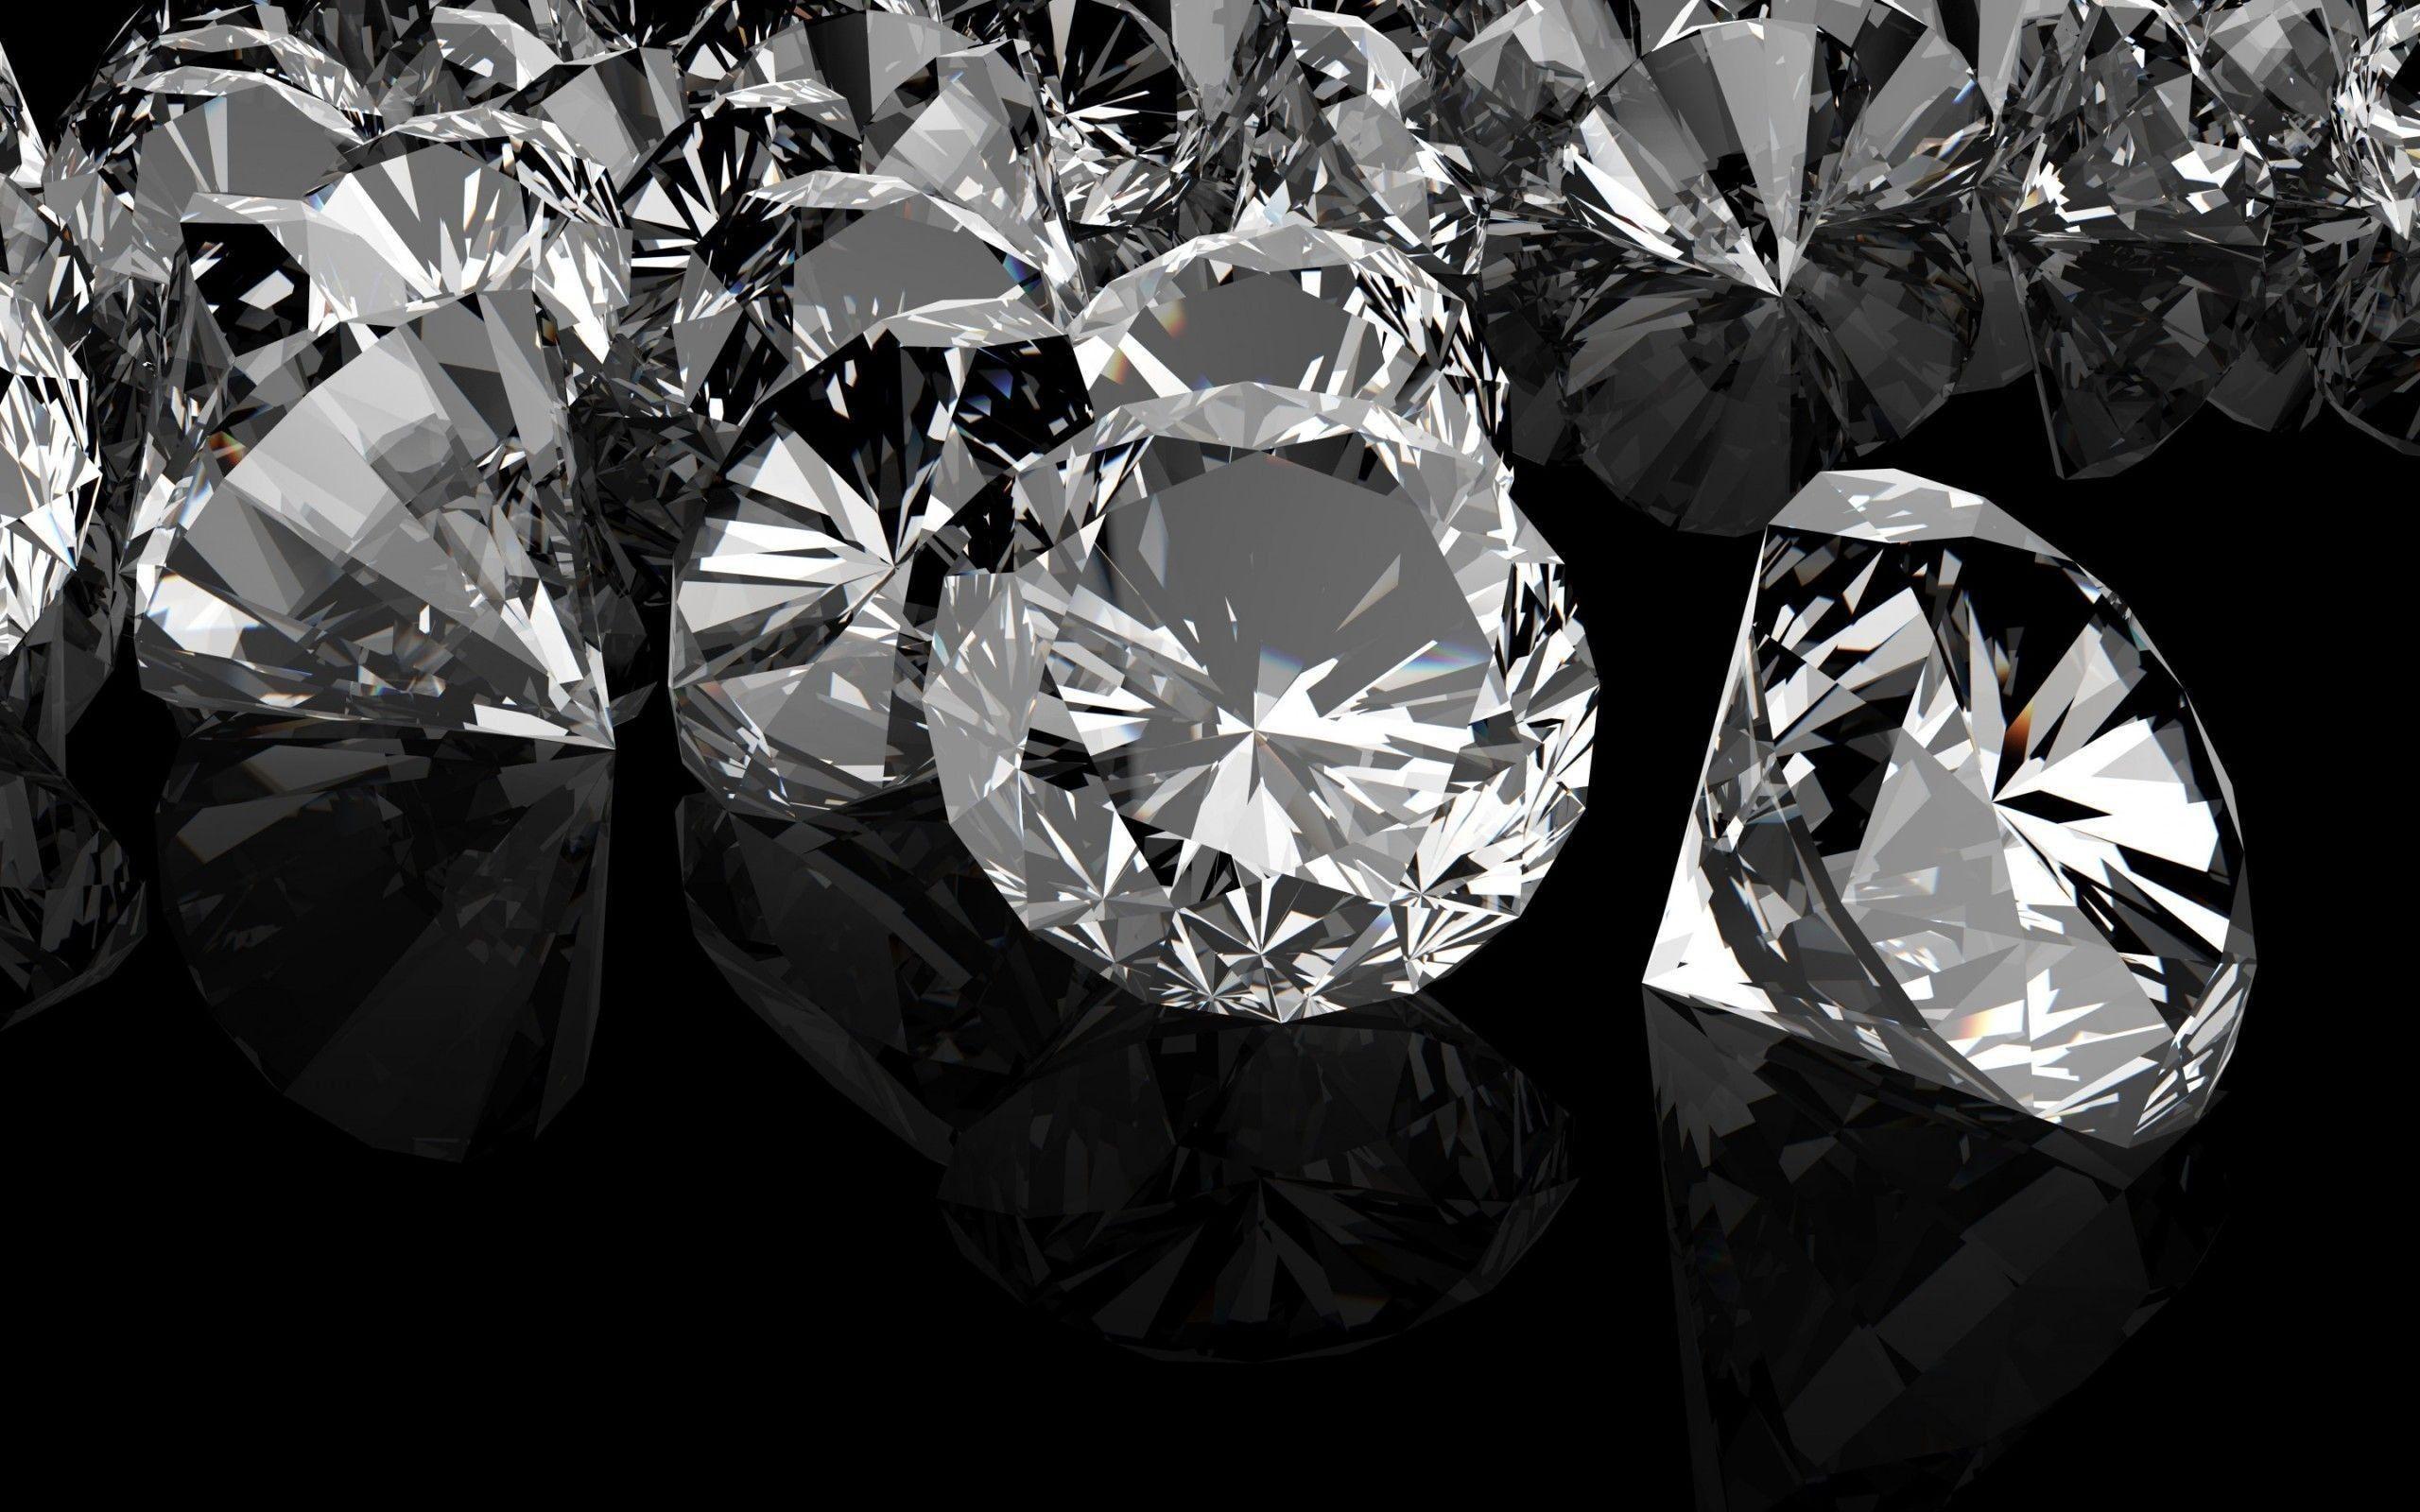 Black Diamond Wallpapers Top Free Black Diamond Backgrounds Wallpaperaccess